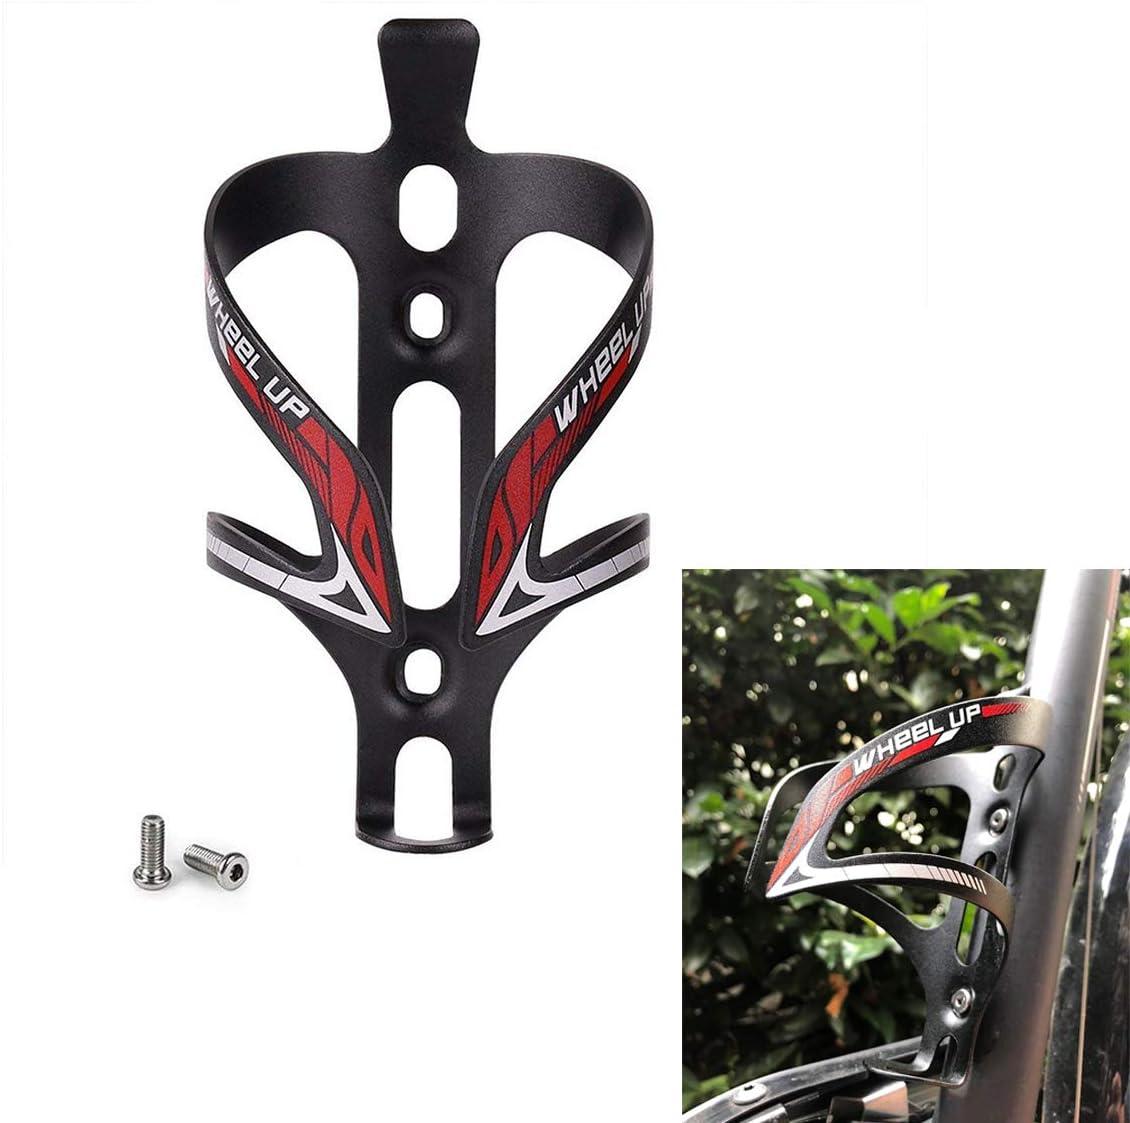 AIMUHO Portabidón de Bicicleta, Aleación de Aluminio Ultraligero Portabidones Bicicleta Porta Botellas Bicicleta Water Bottle Cage